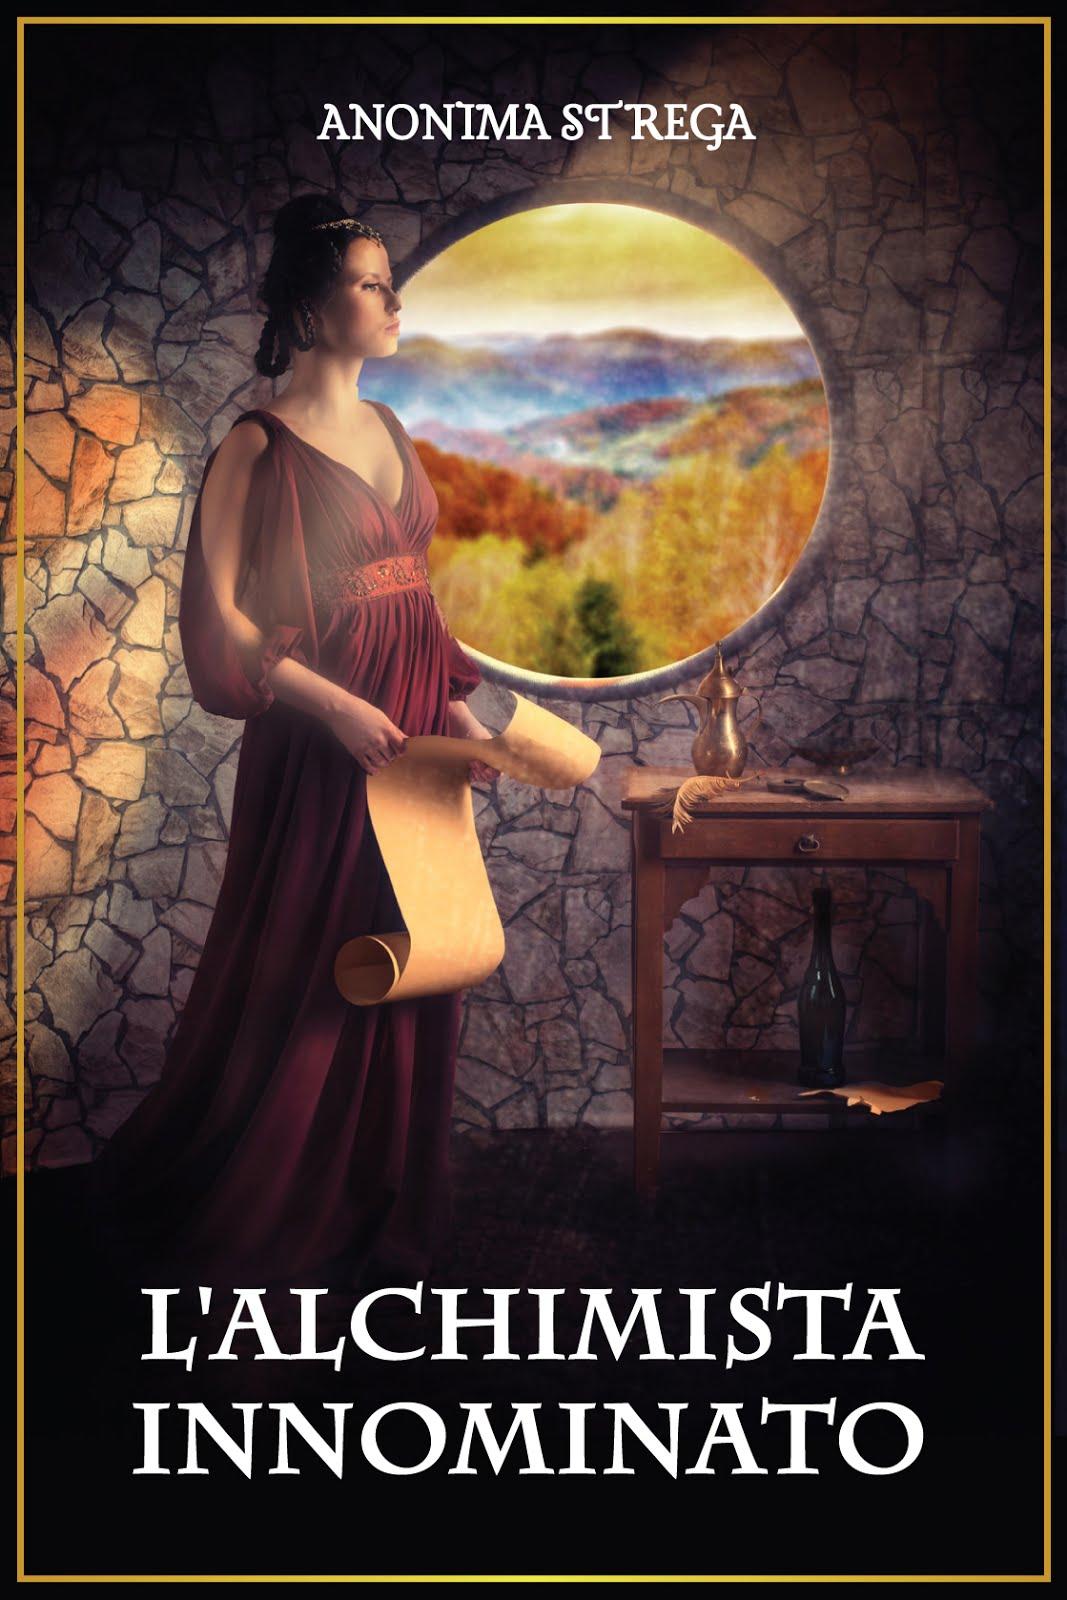 L'Alchimista Innominato - Historical Romance